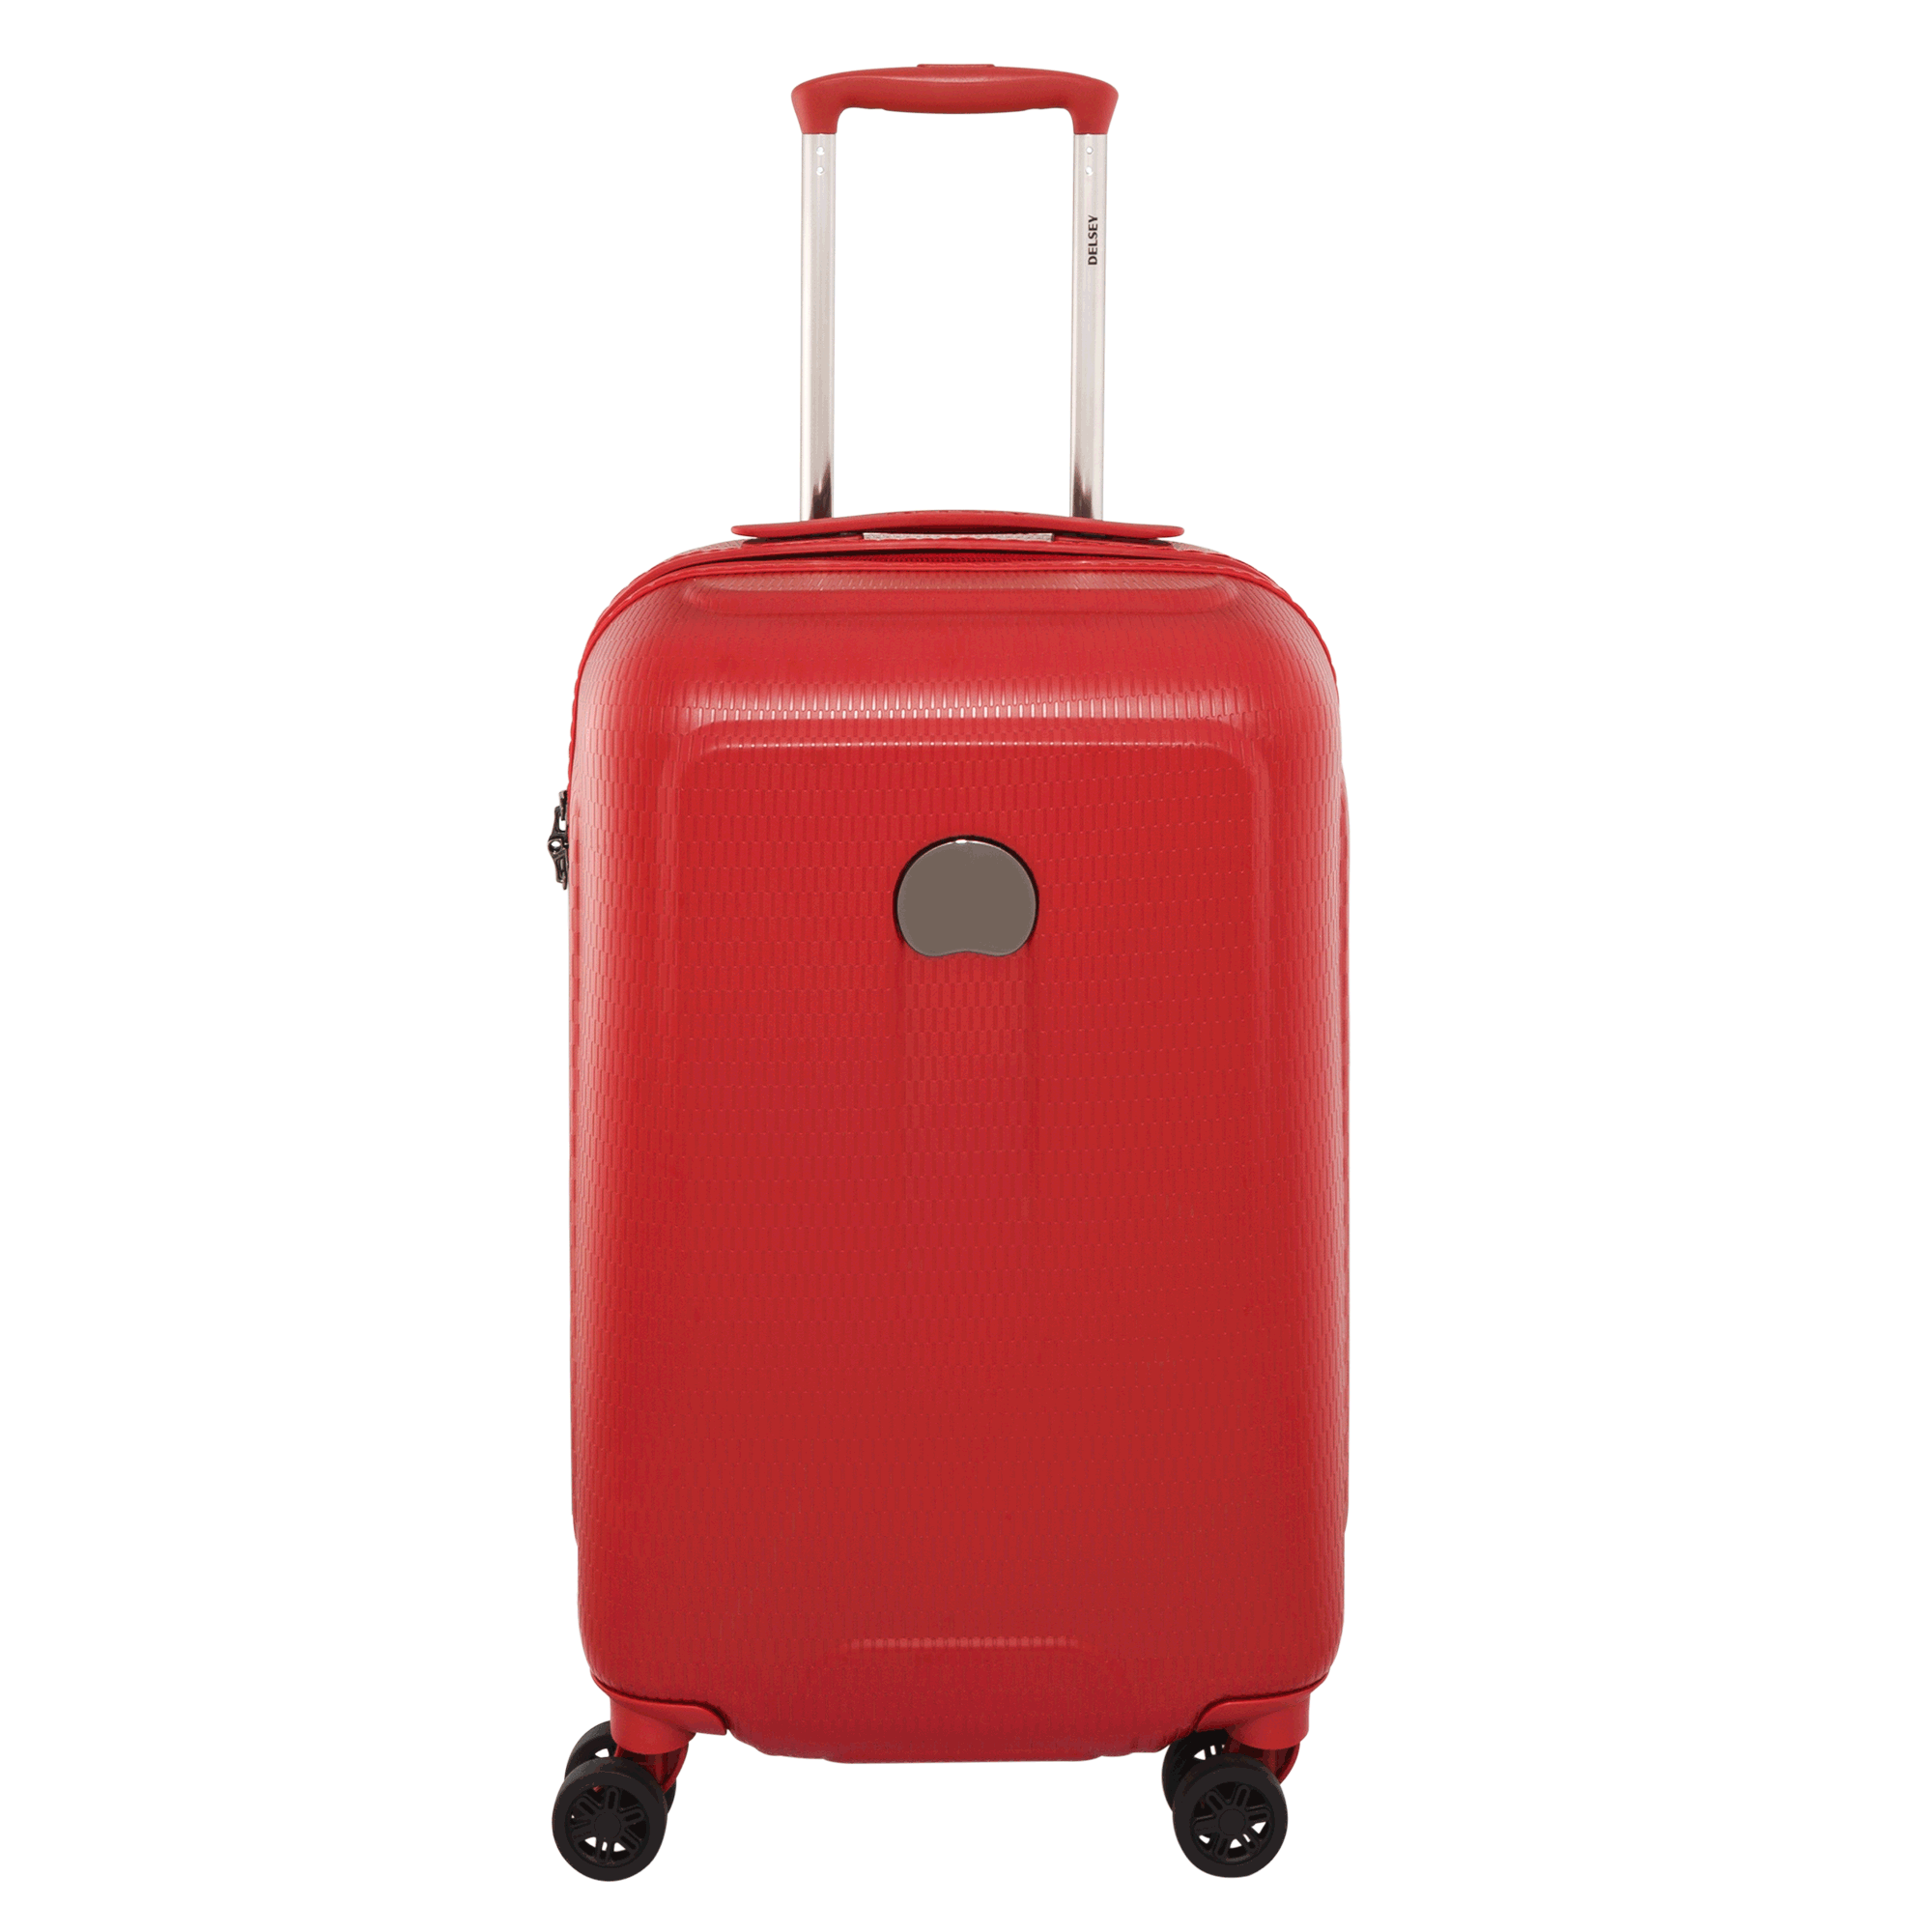 Luggage pink suitcase